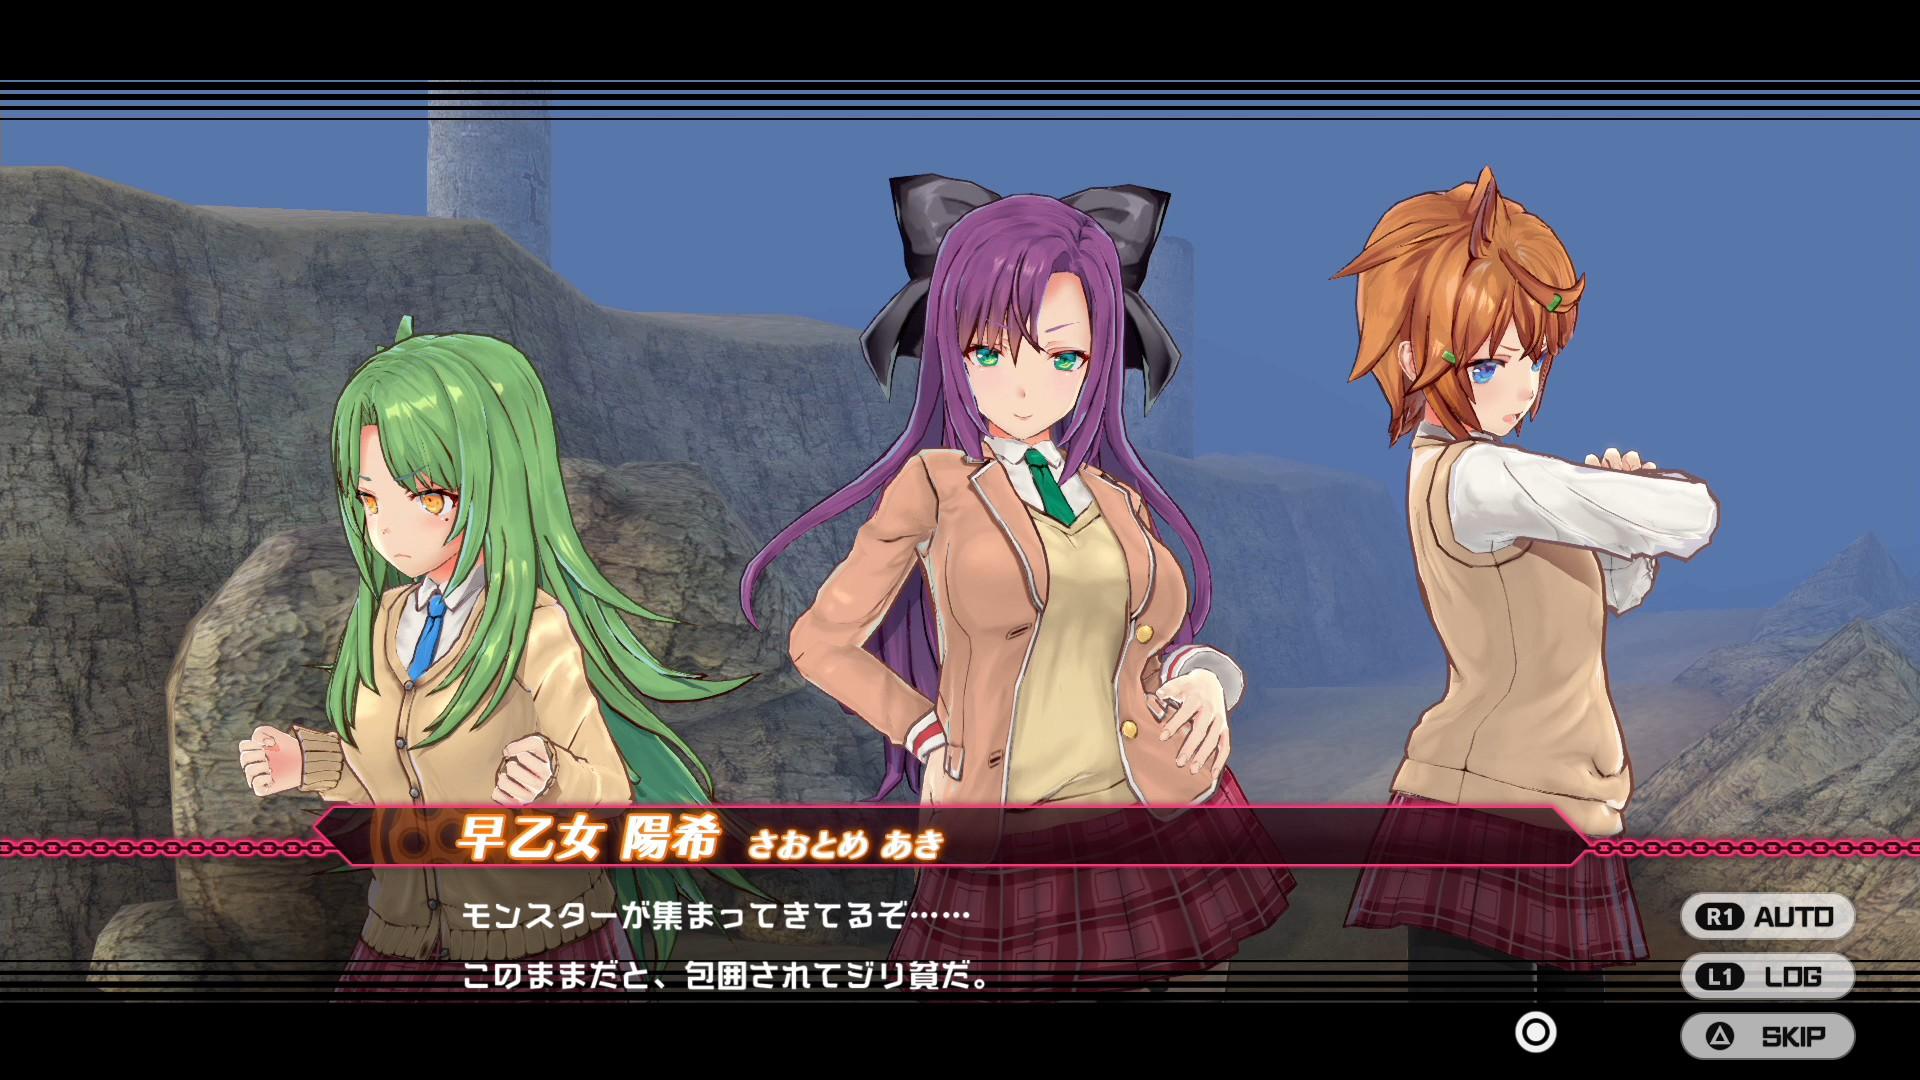 Геймплей - Bullet Girls Phantasia